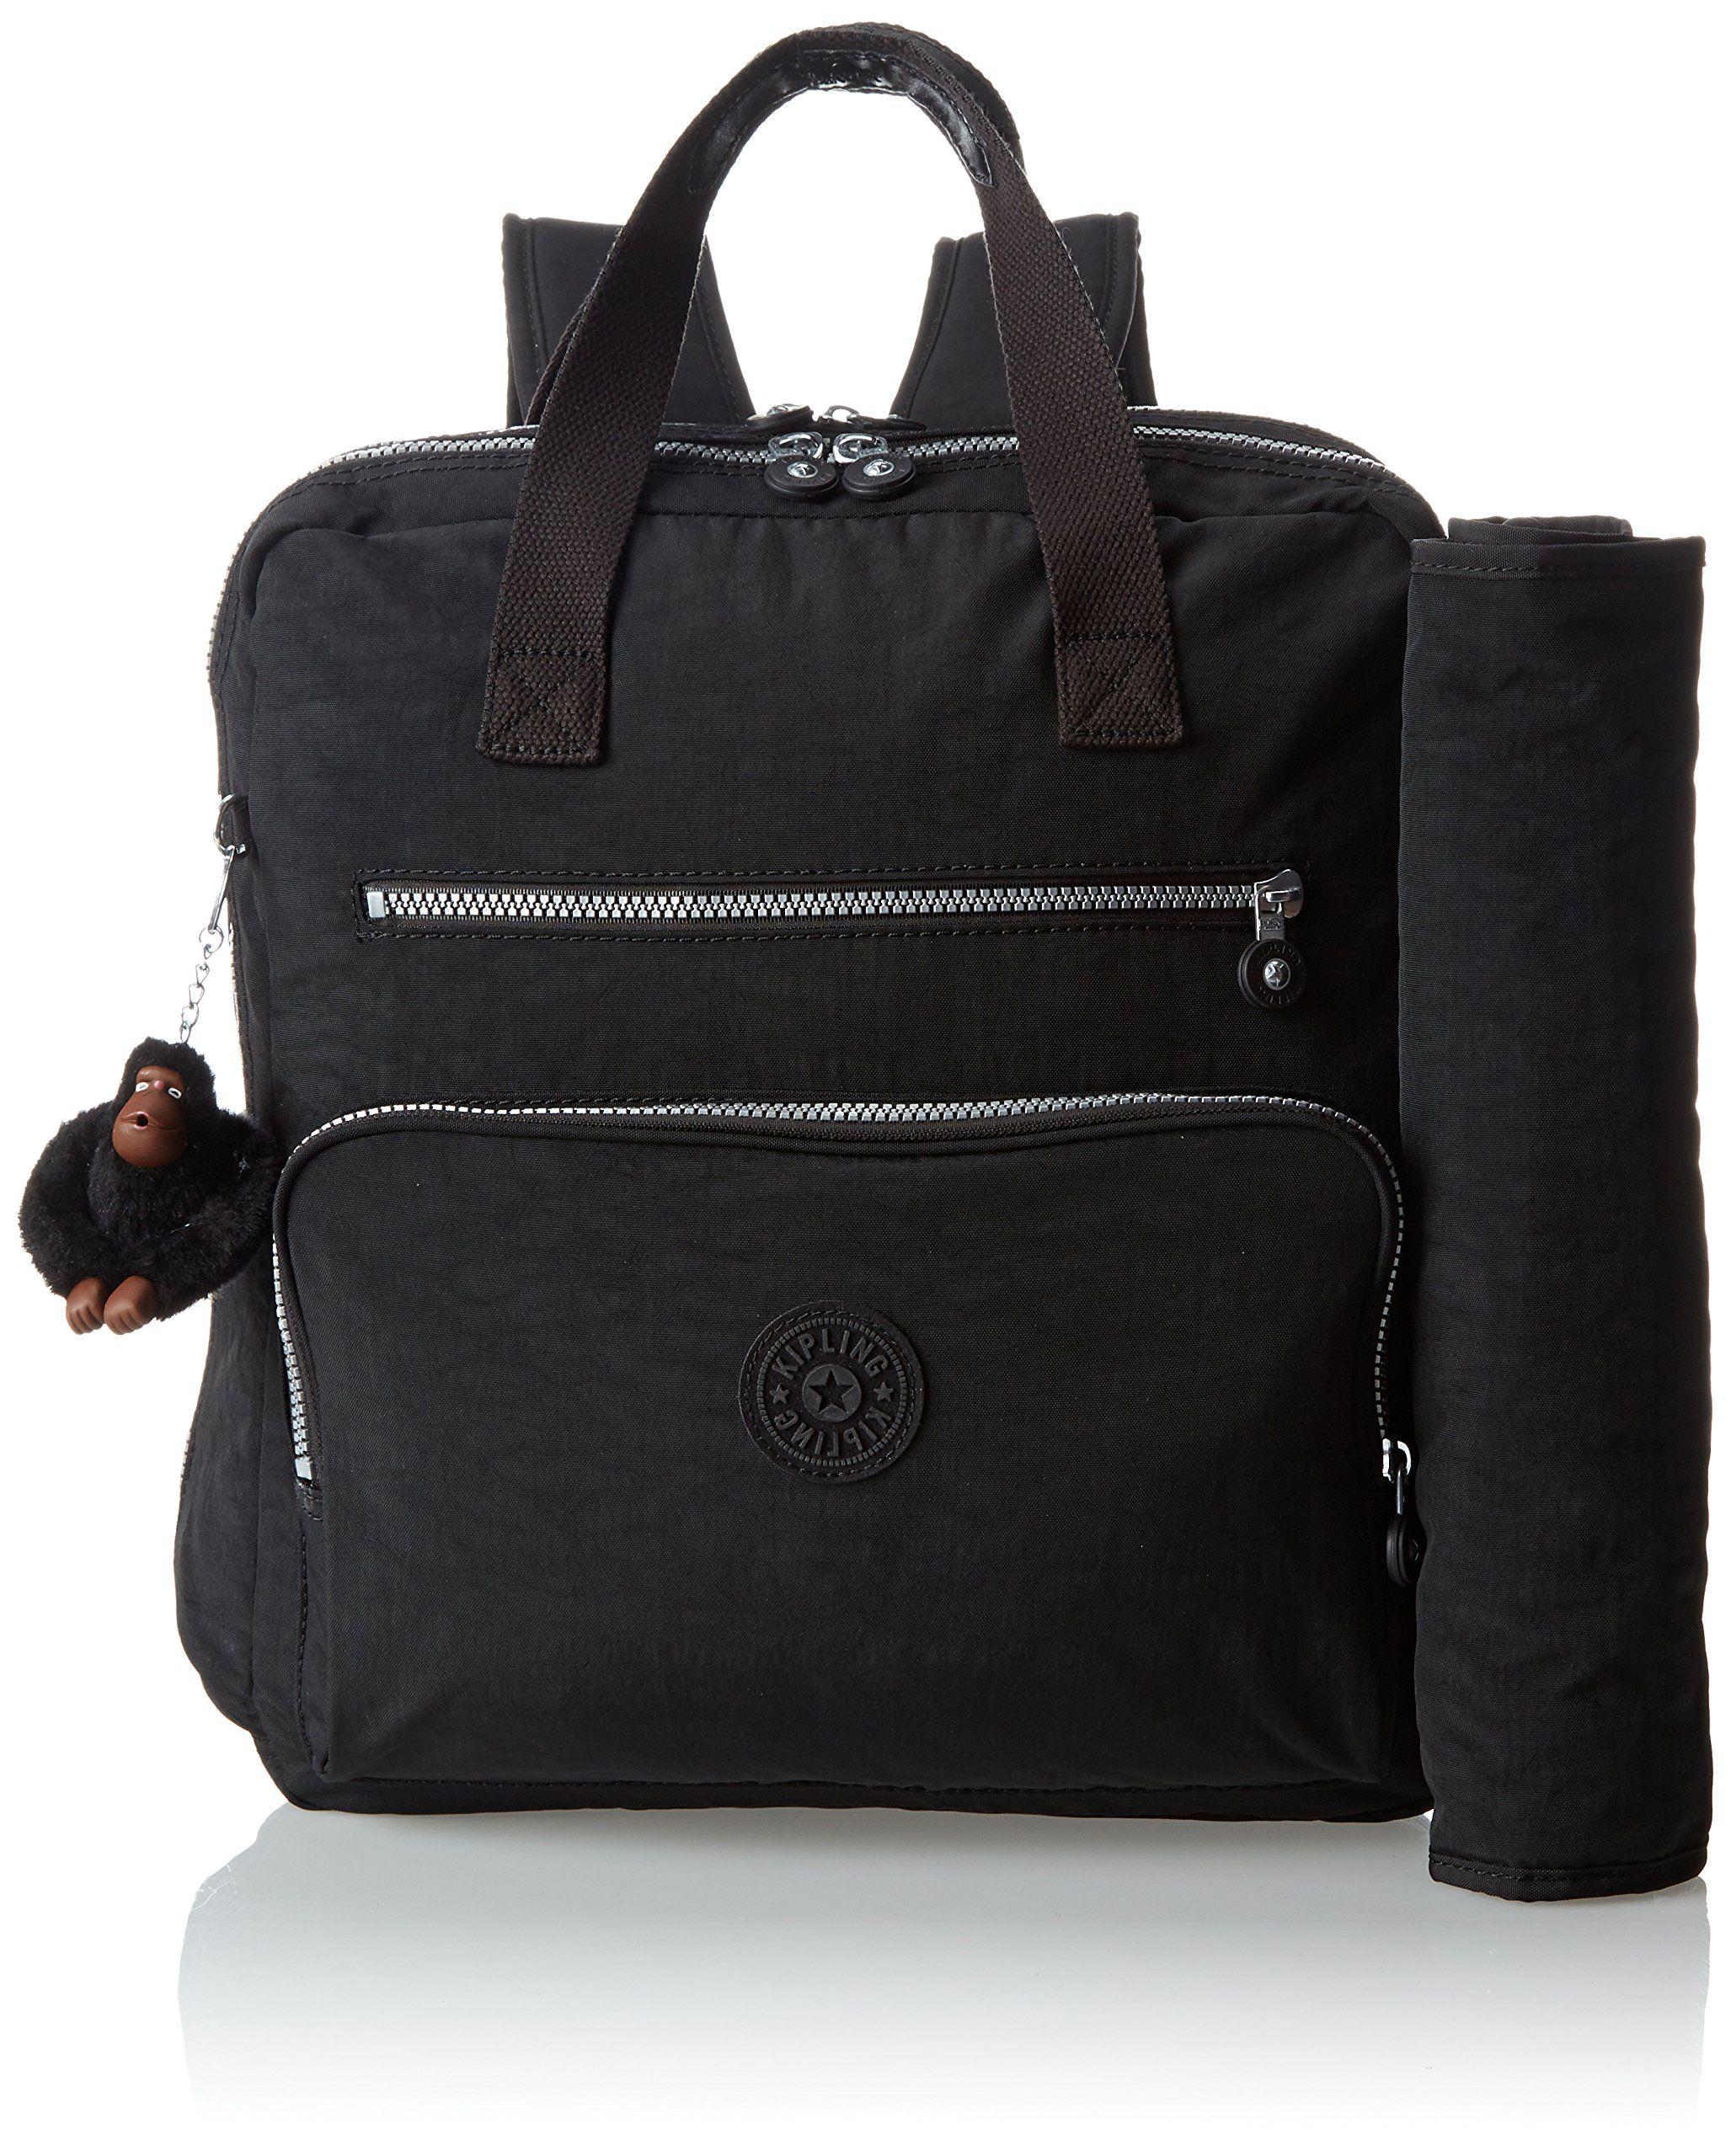 bd4a5a5a9 Amazon.com: Kipling Audra, Black, One Size: Clothing | Unisex Diaper ...